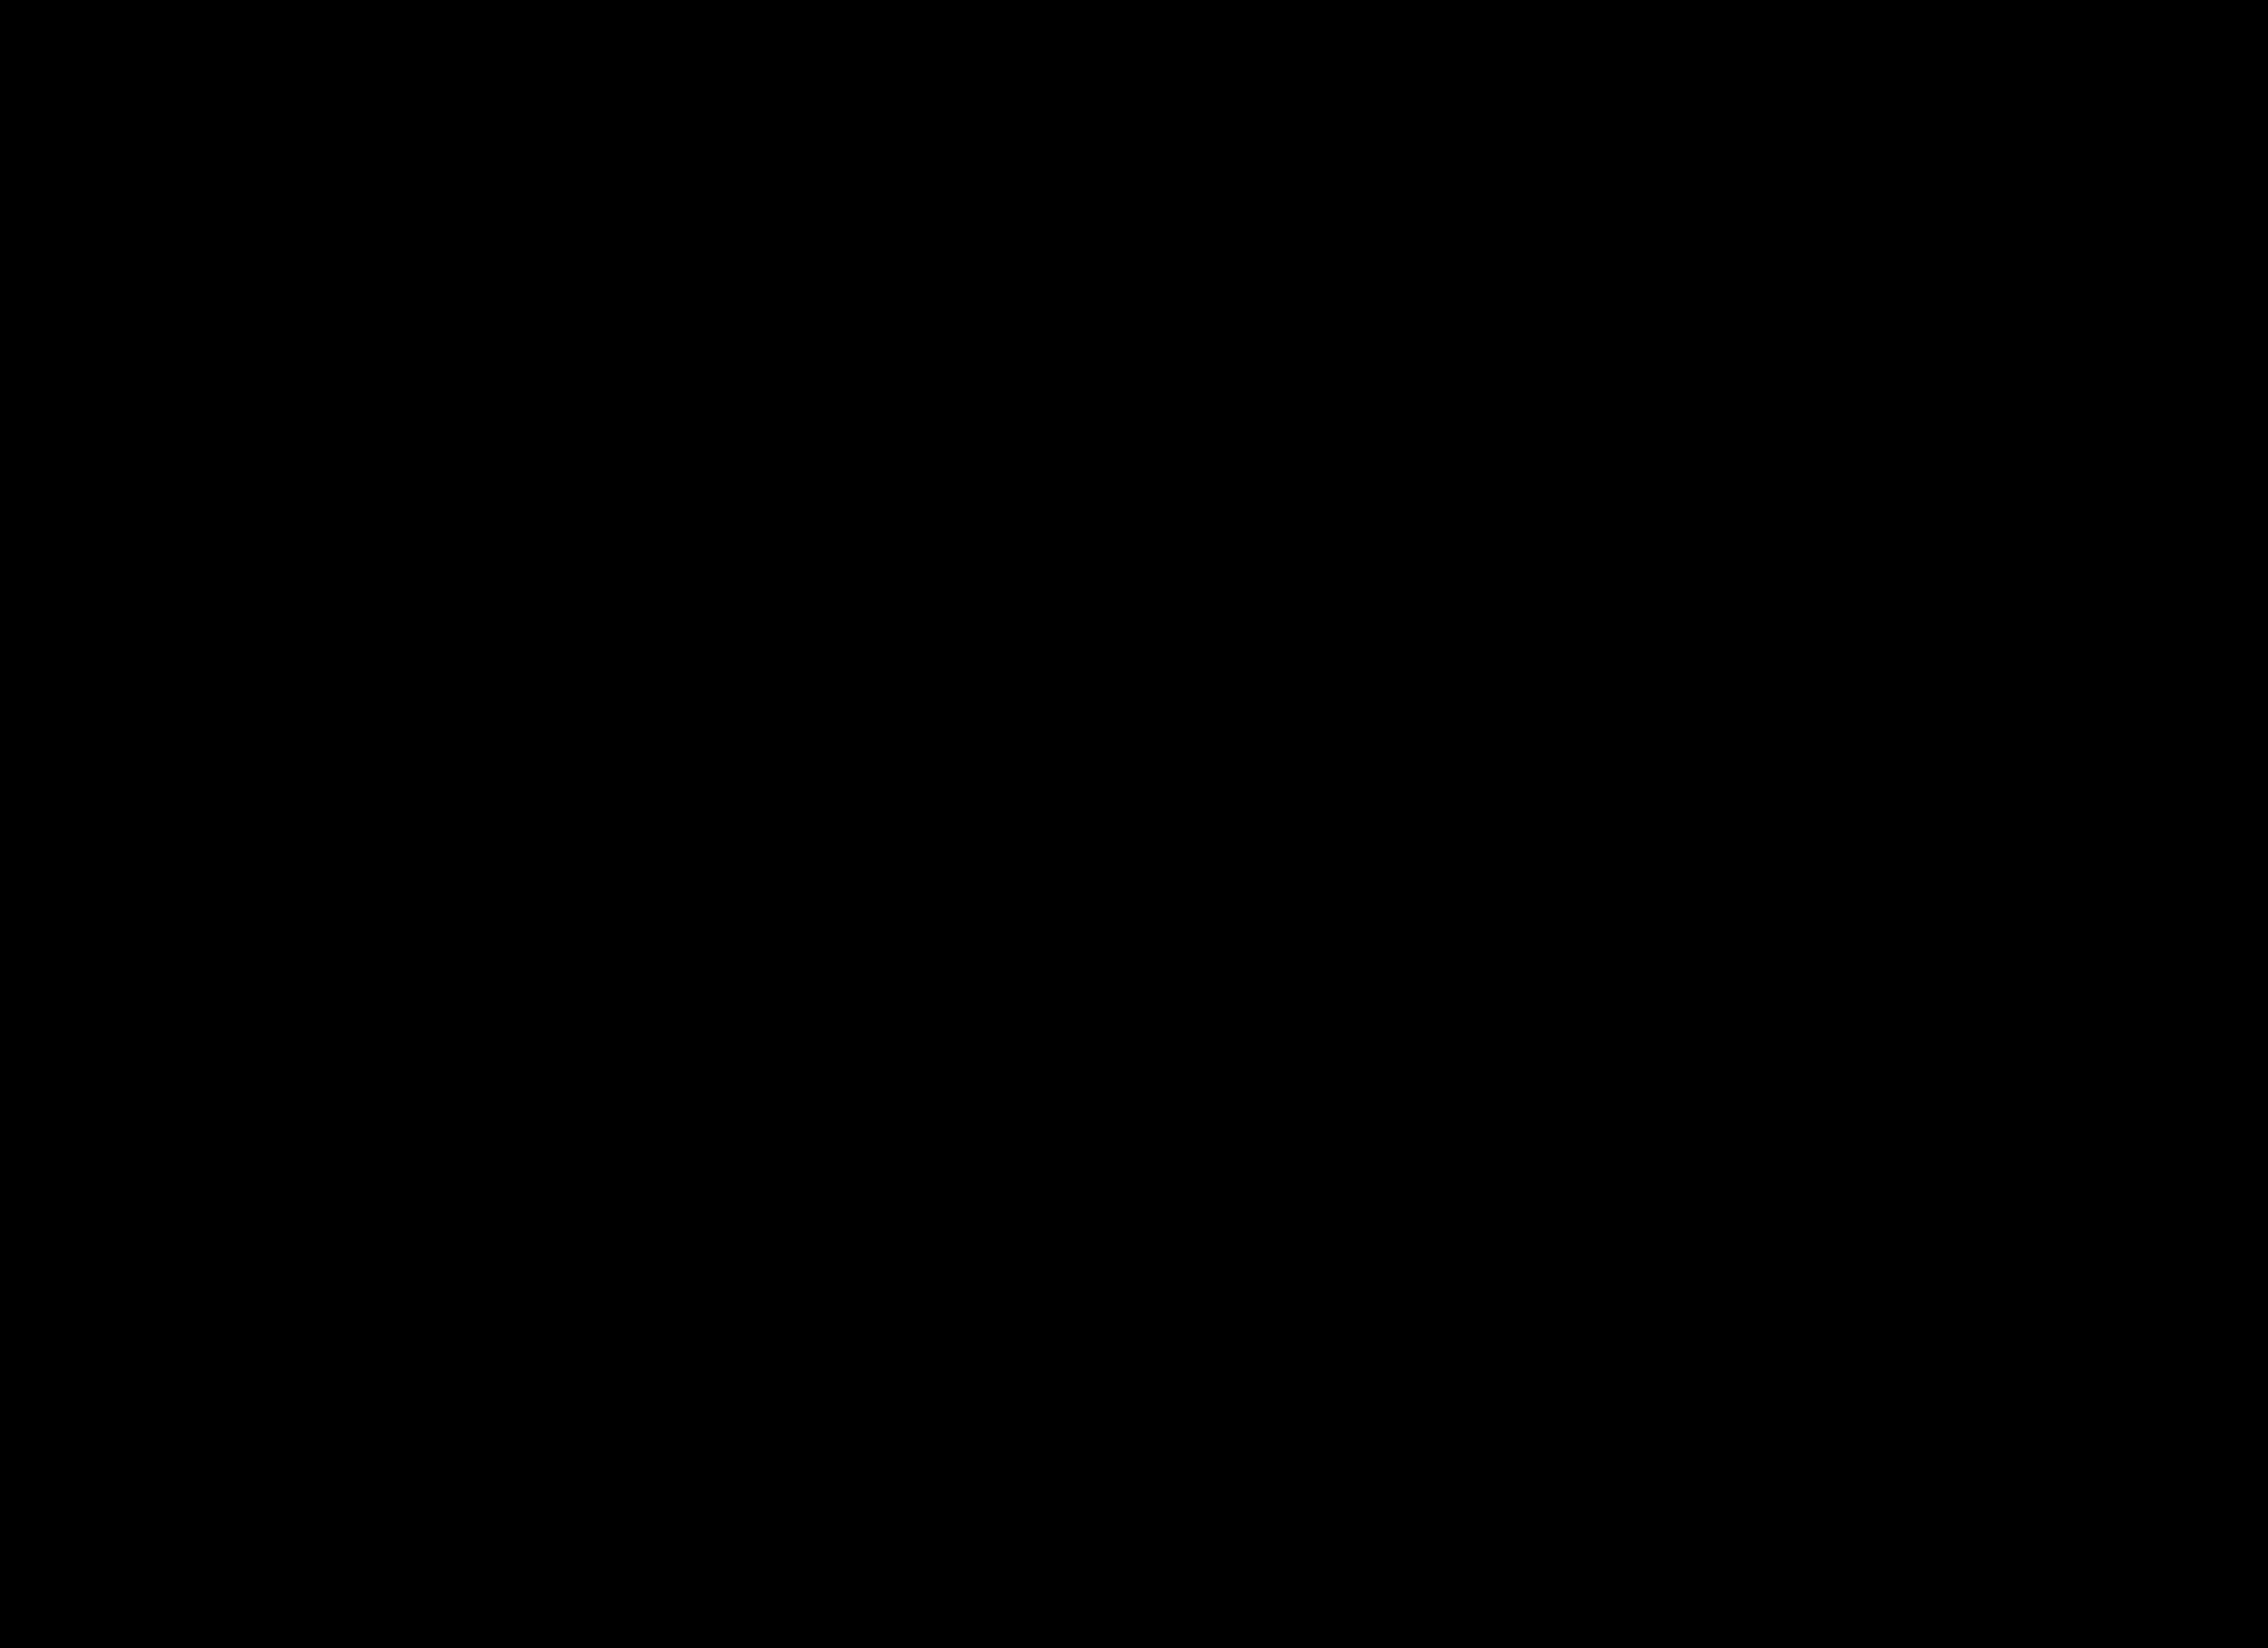 Haut de maillot triangle ajustable Bermudes Black